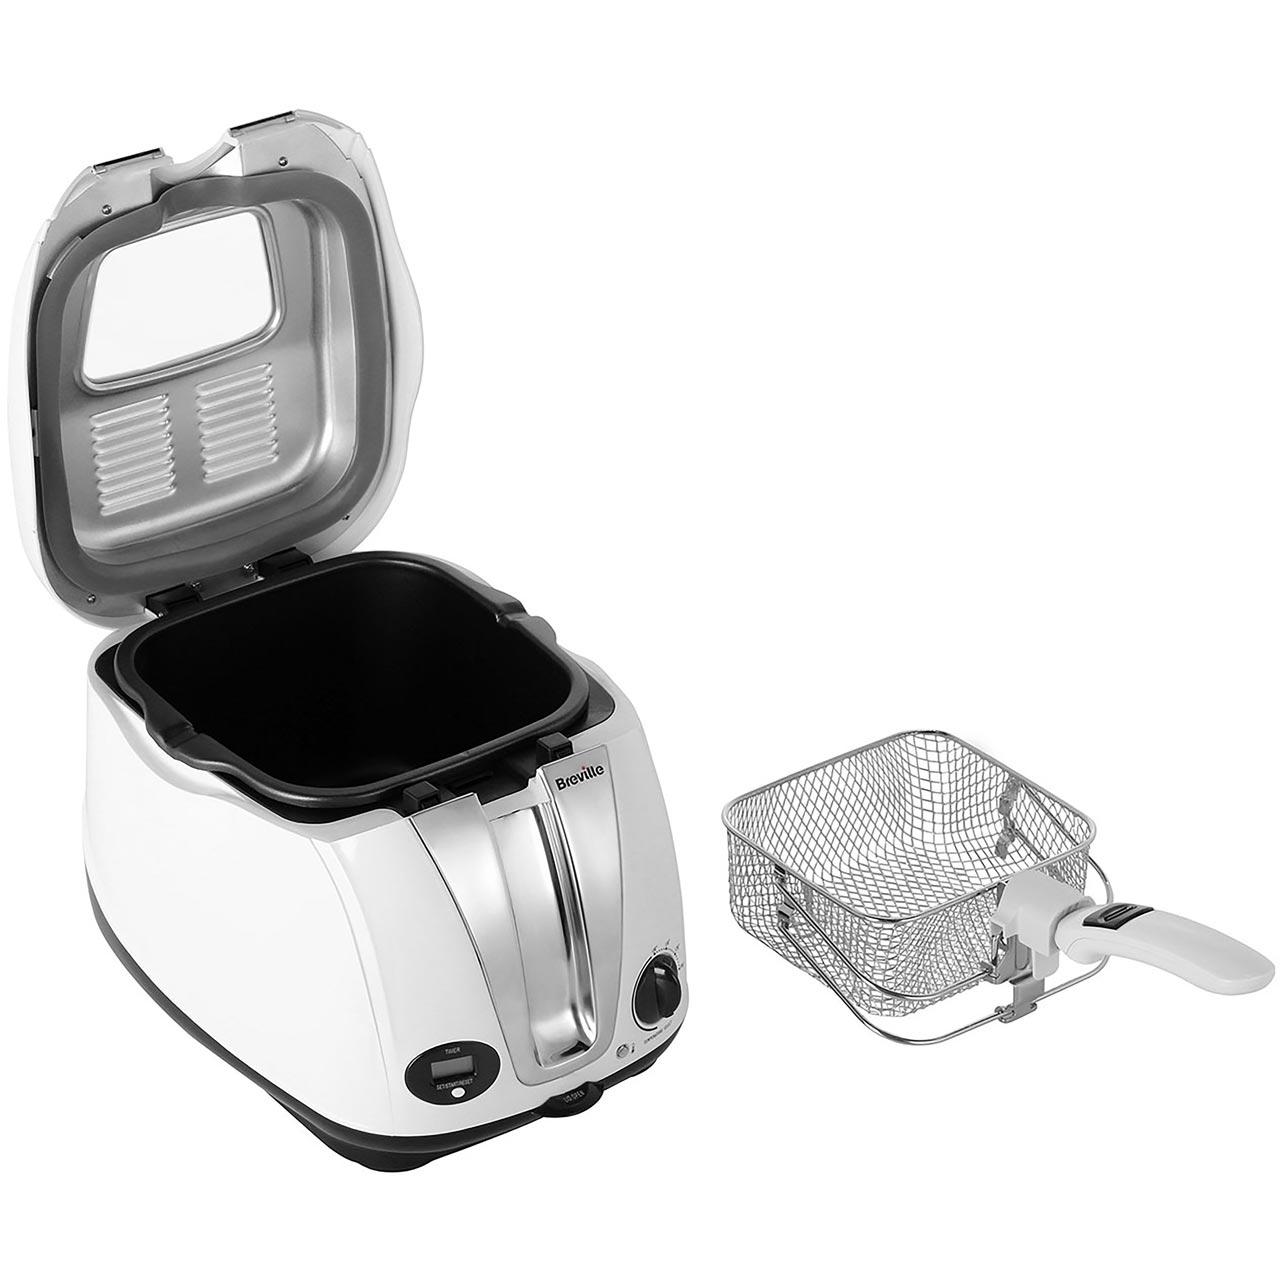 Breville Vdf108 Easy Clean Digital Fryer Deep Fat Fryer